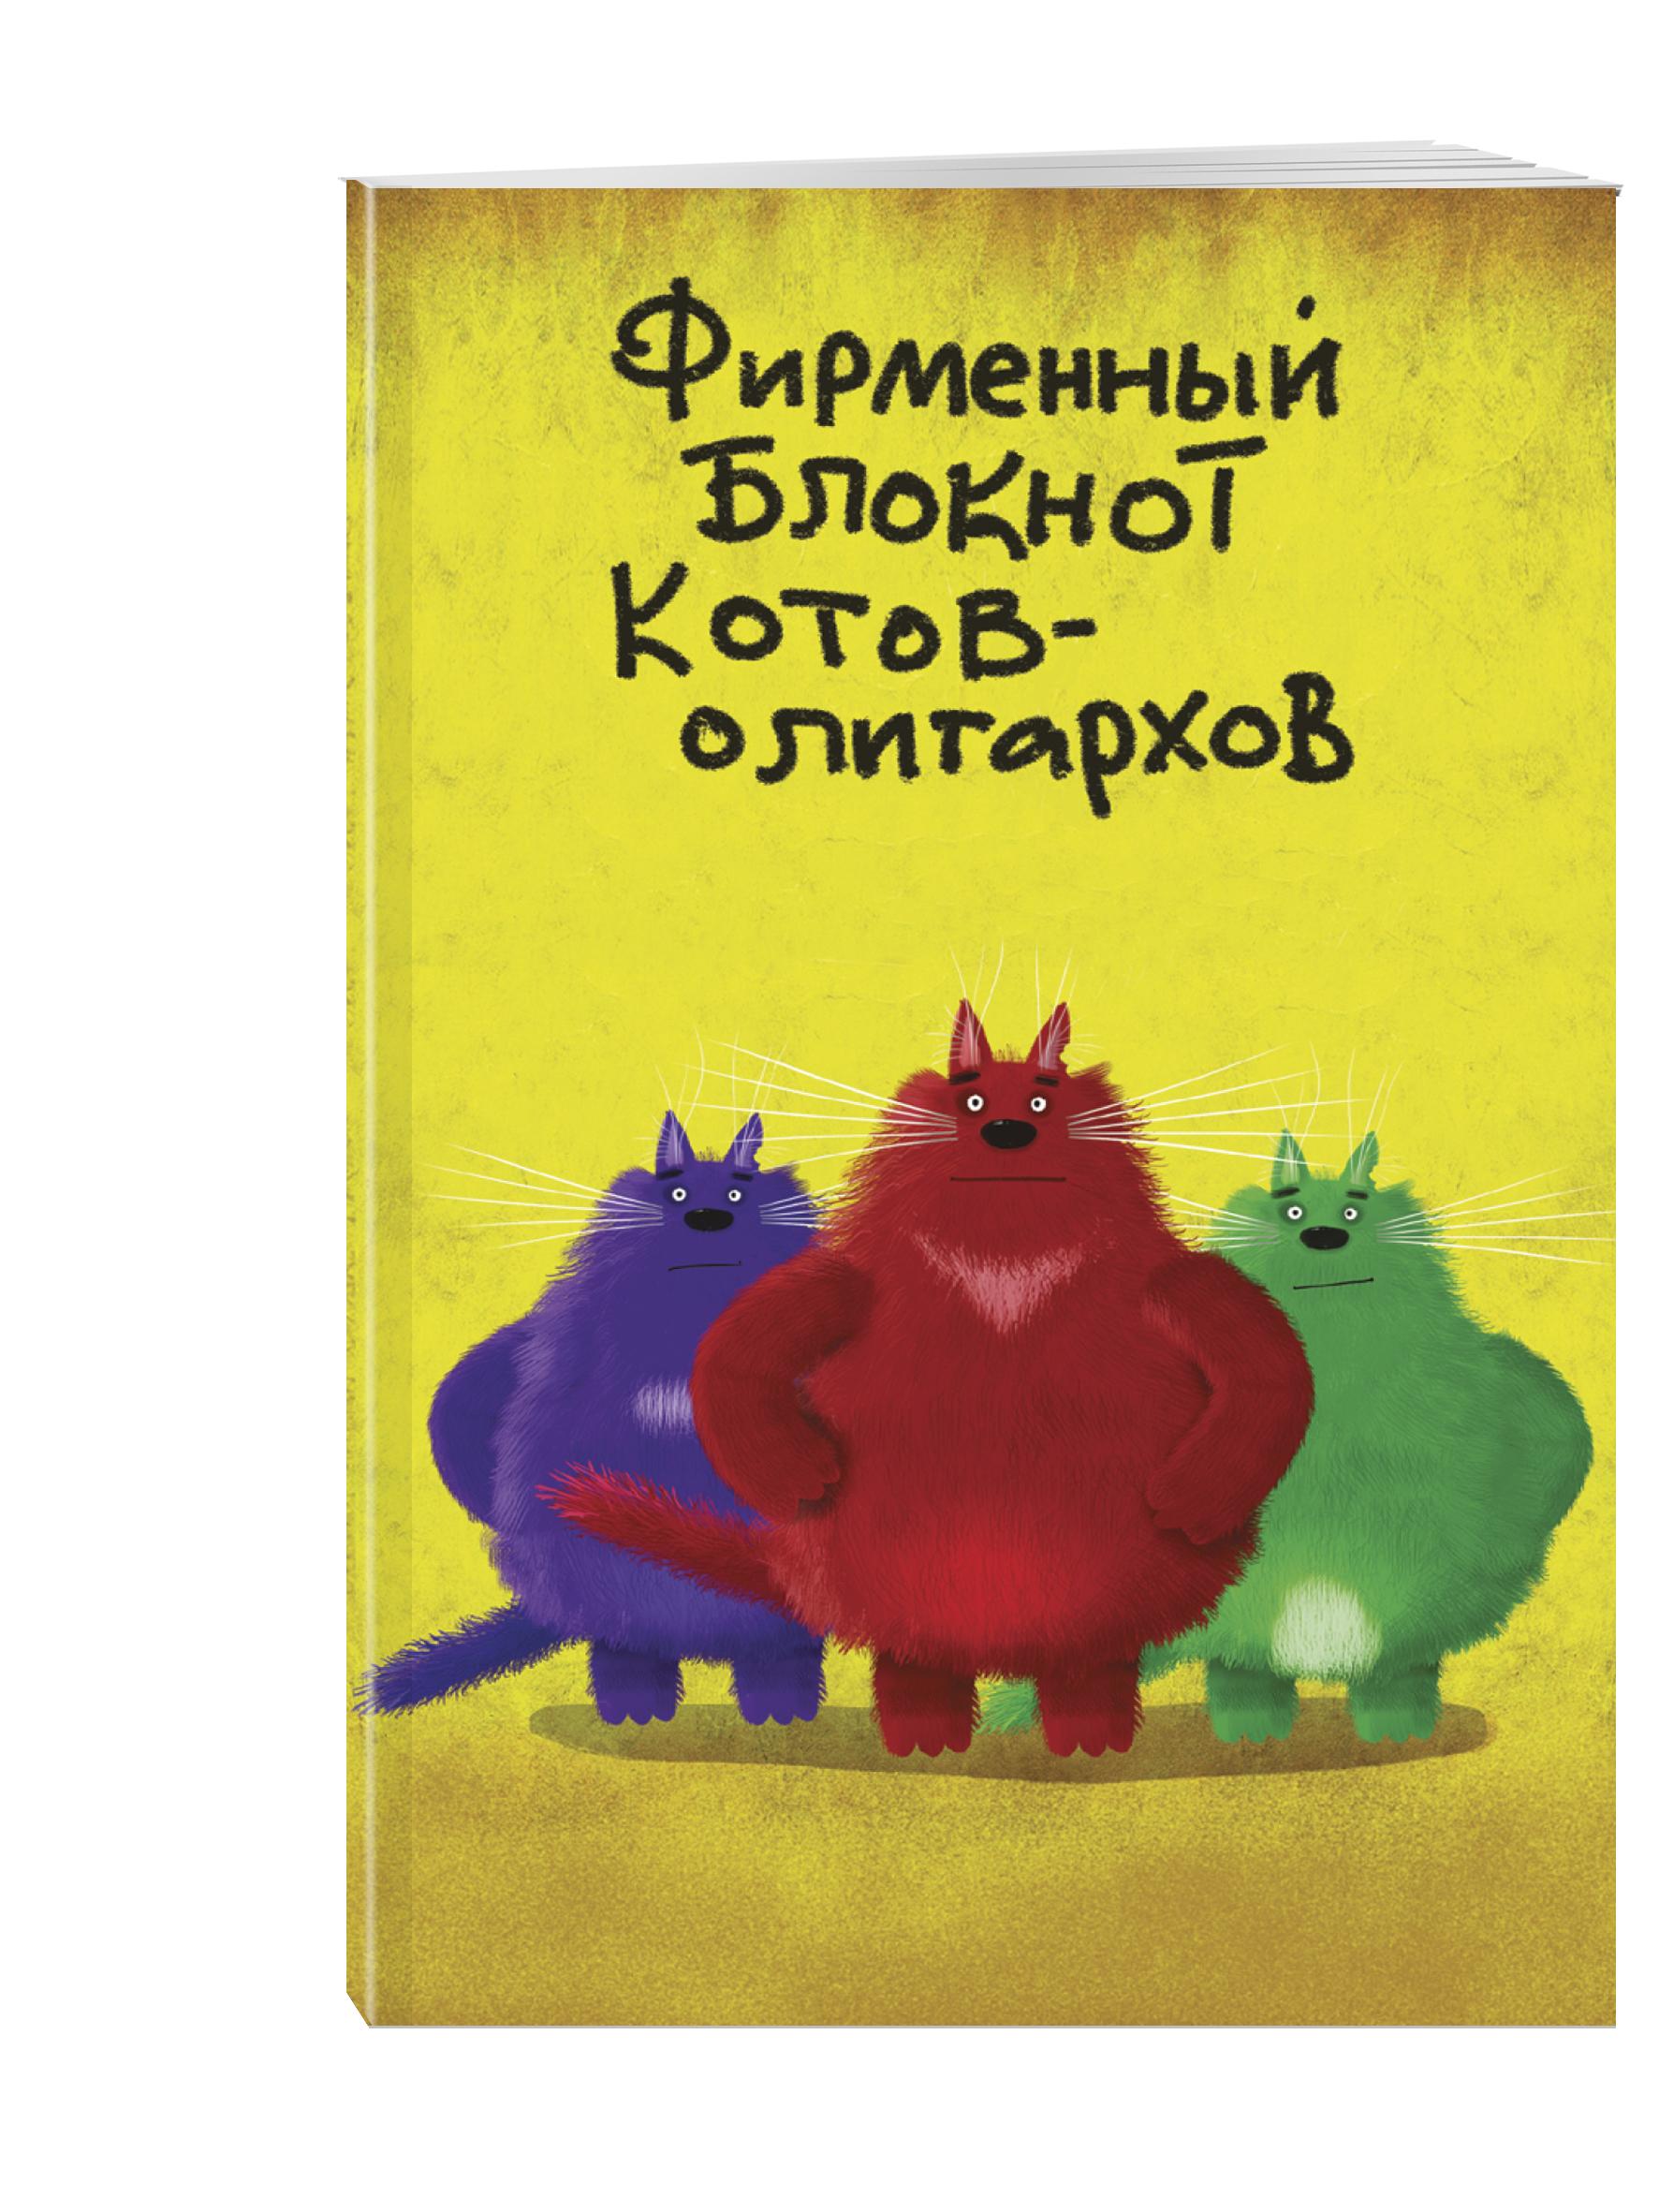 Фирменный блокнот котов-олигархов (в линейку) (А5) блокнот серия natural формат а5 140 стр темно синий в линейку